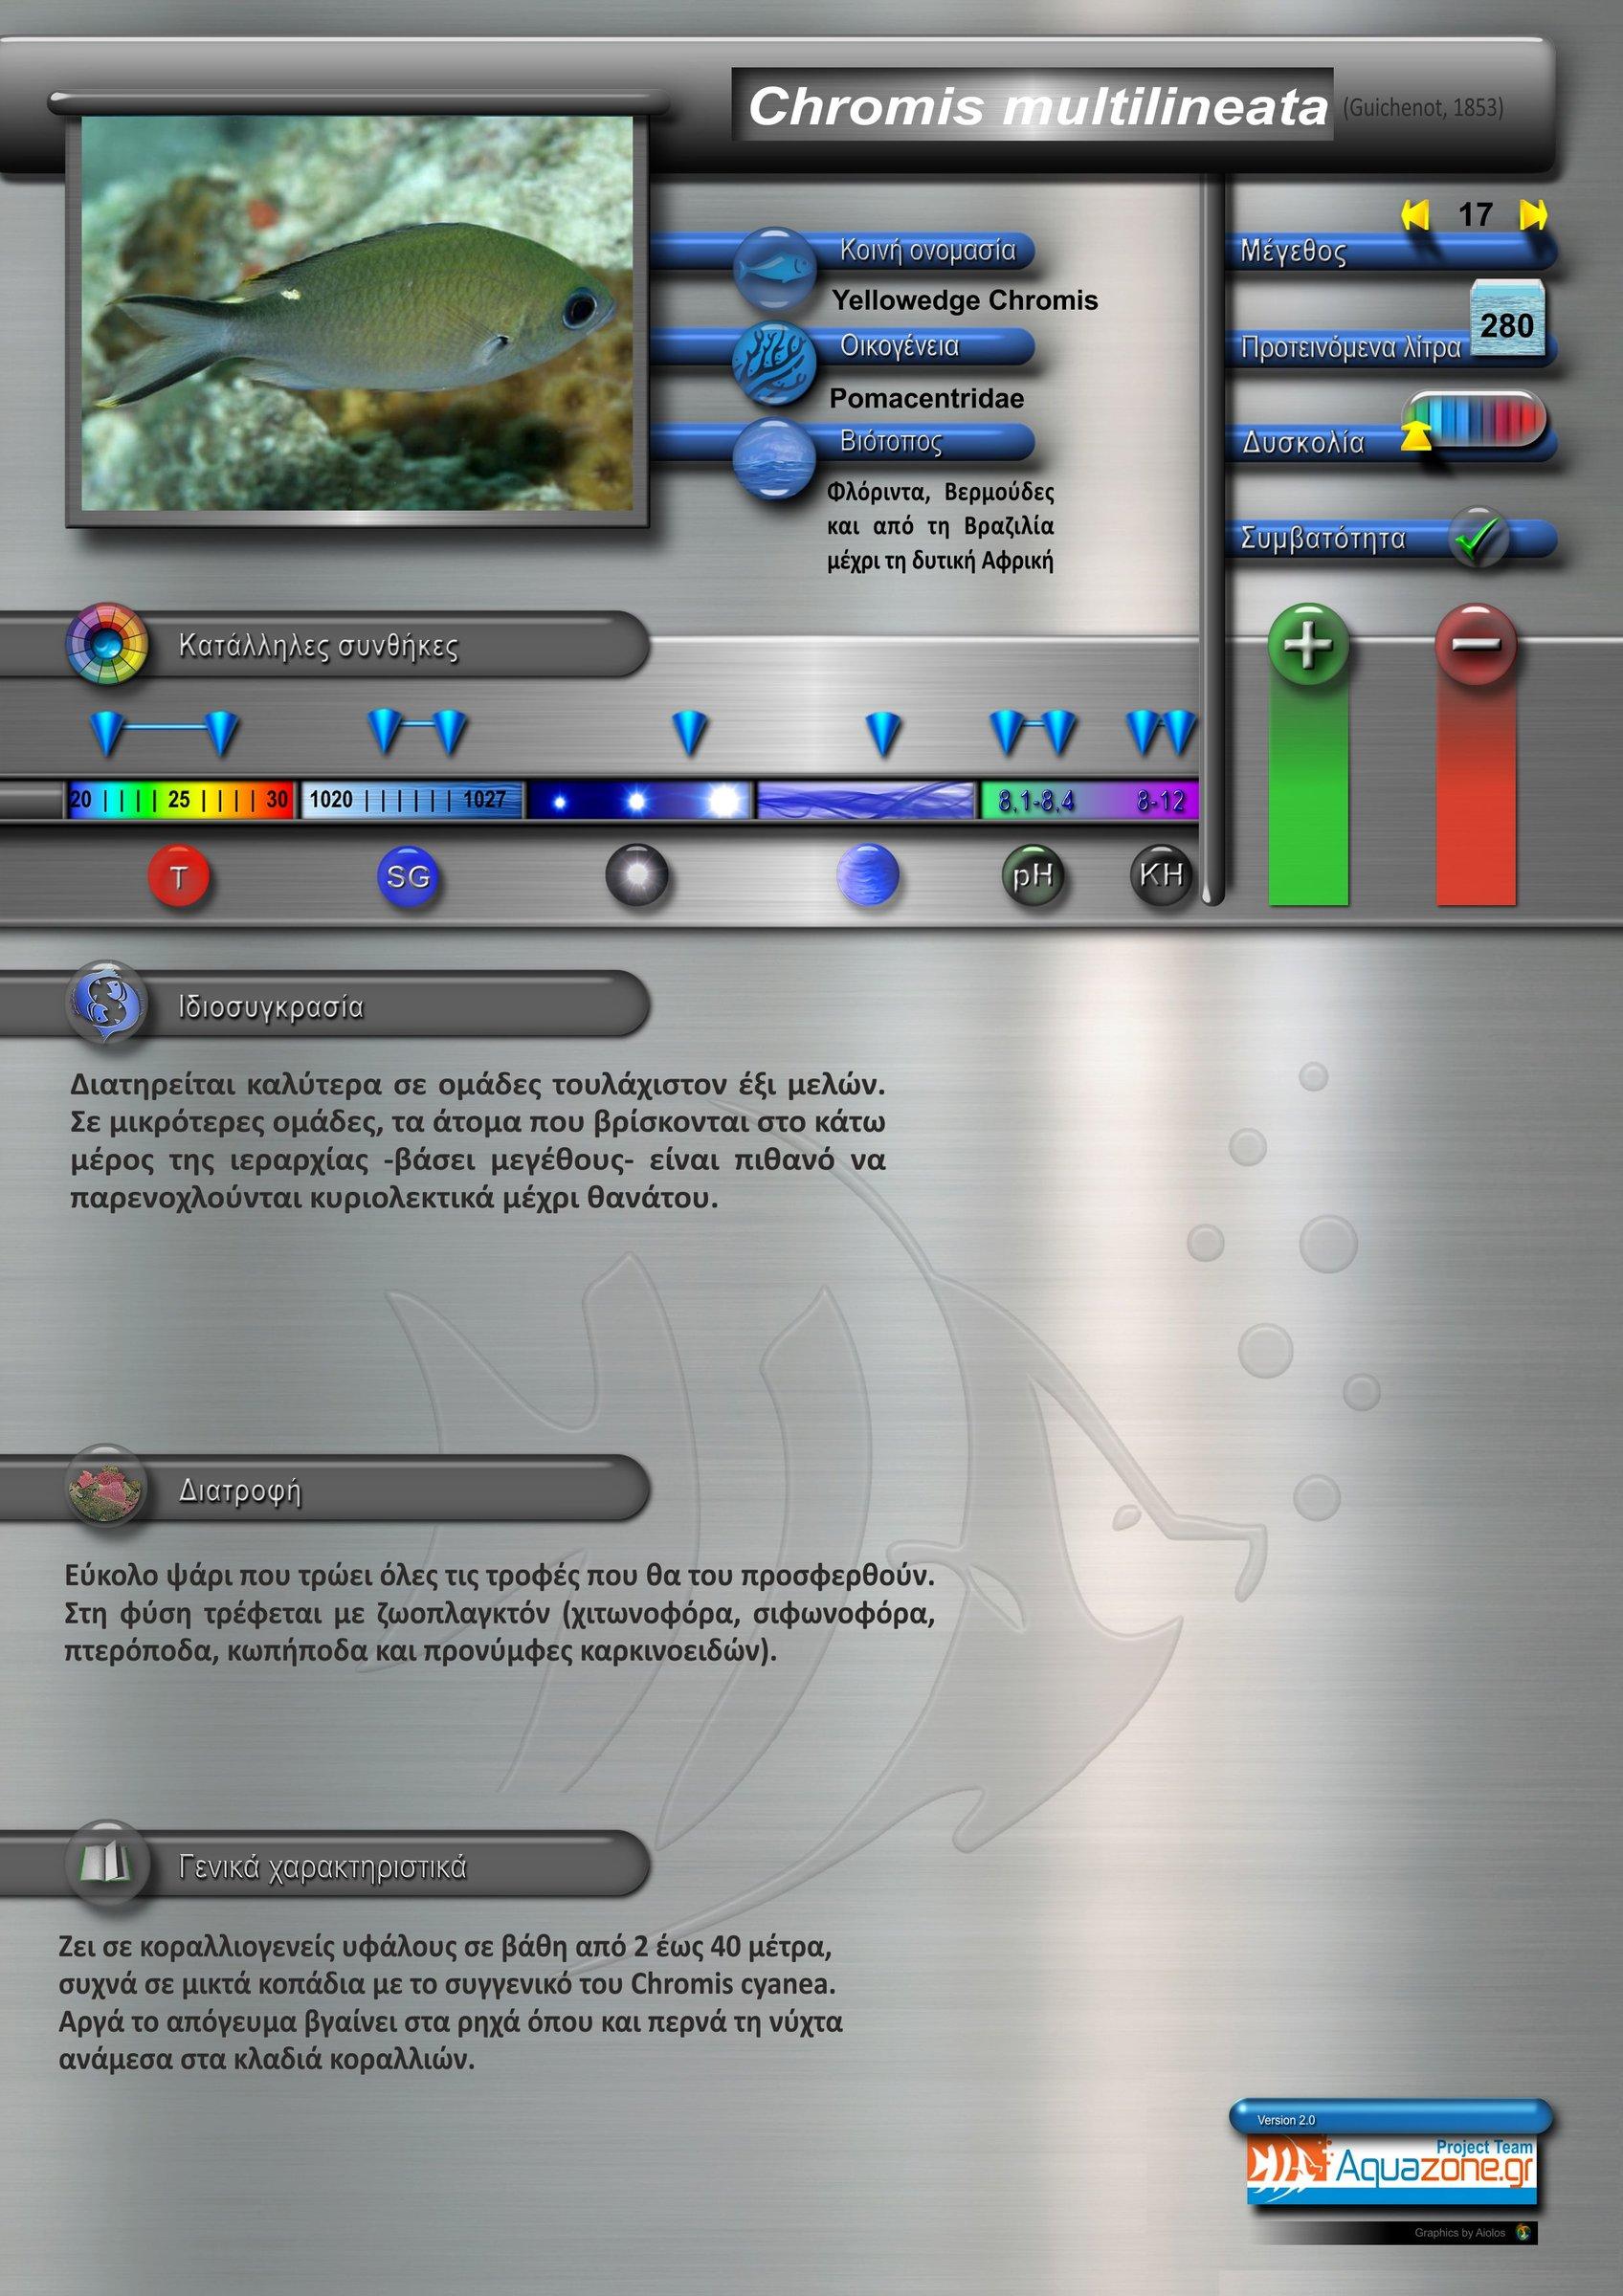 Chromis multilineata.jpg